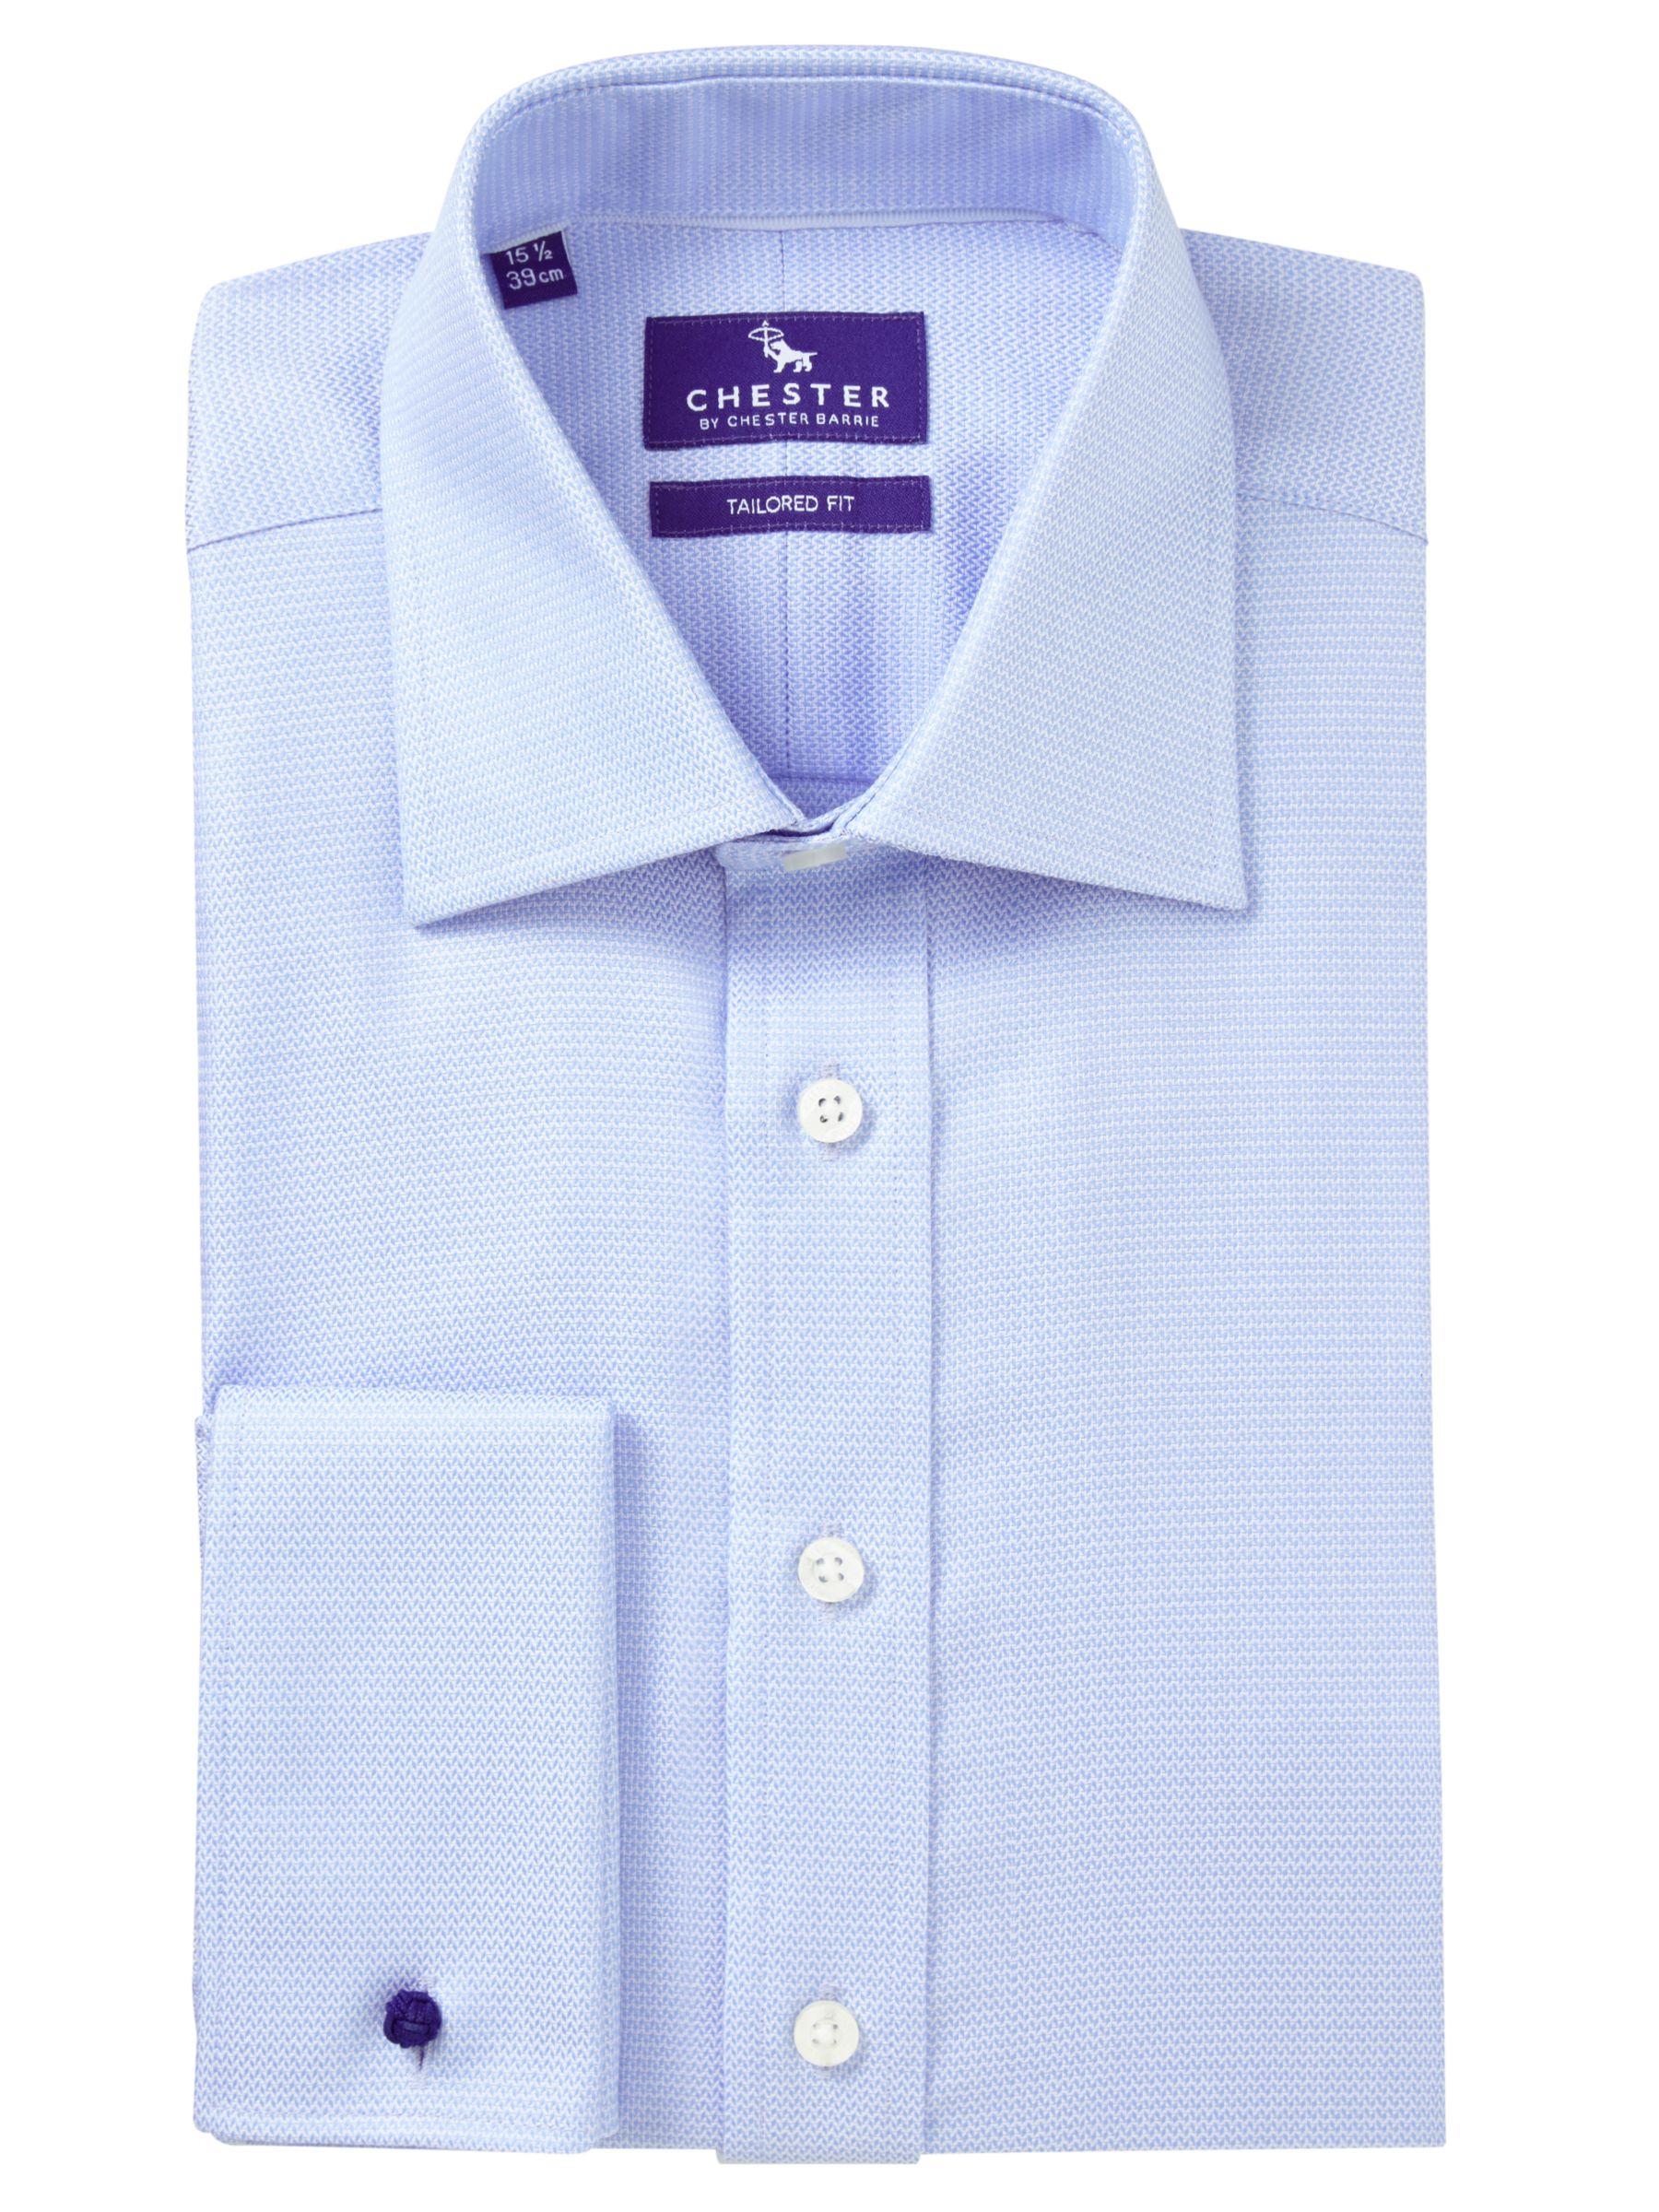 Chester by Chester Barrie Chester by Chester Barrie Jacquard Tailored Fit Shirt